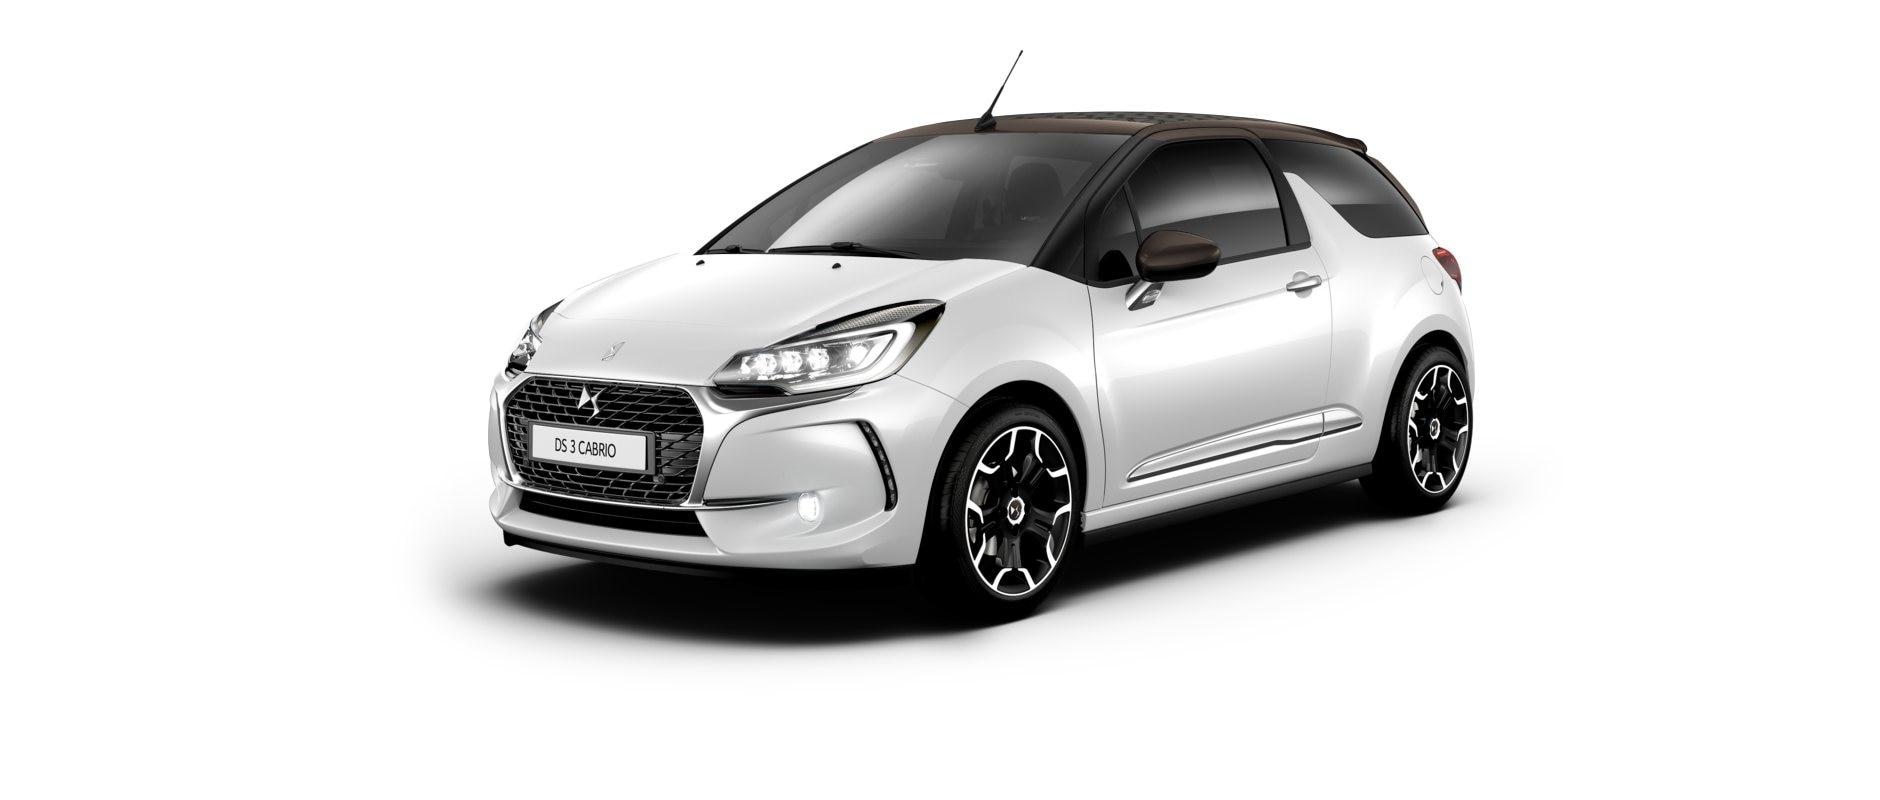 NDS3-Cabrio-Blanc-perle-AV